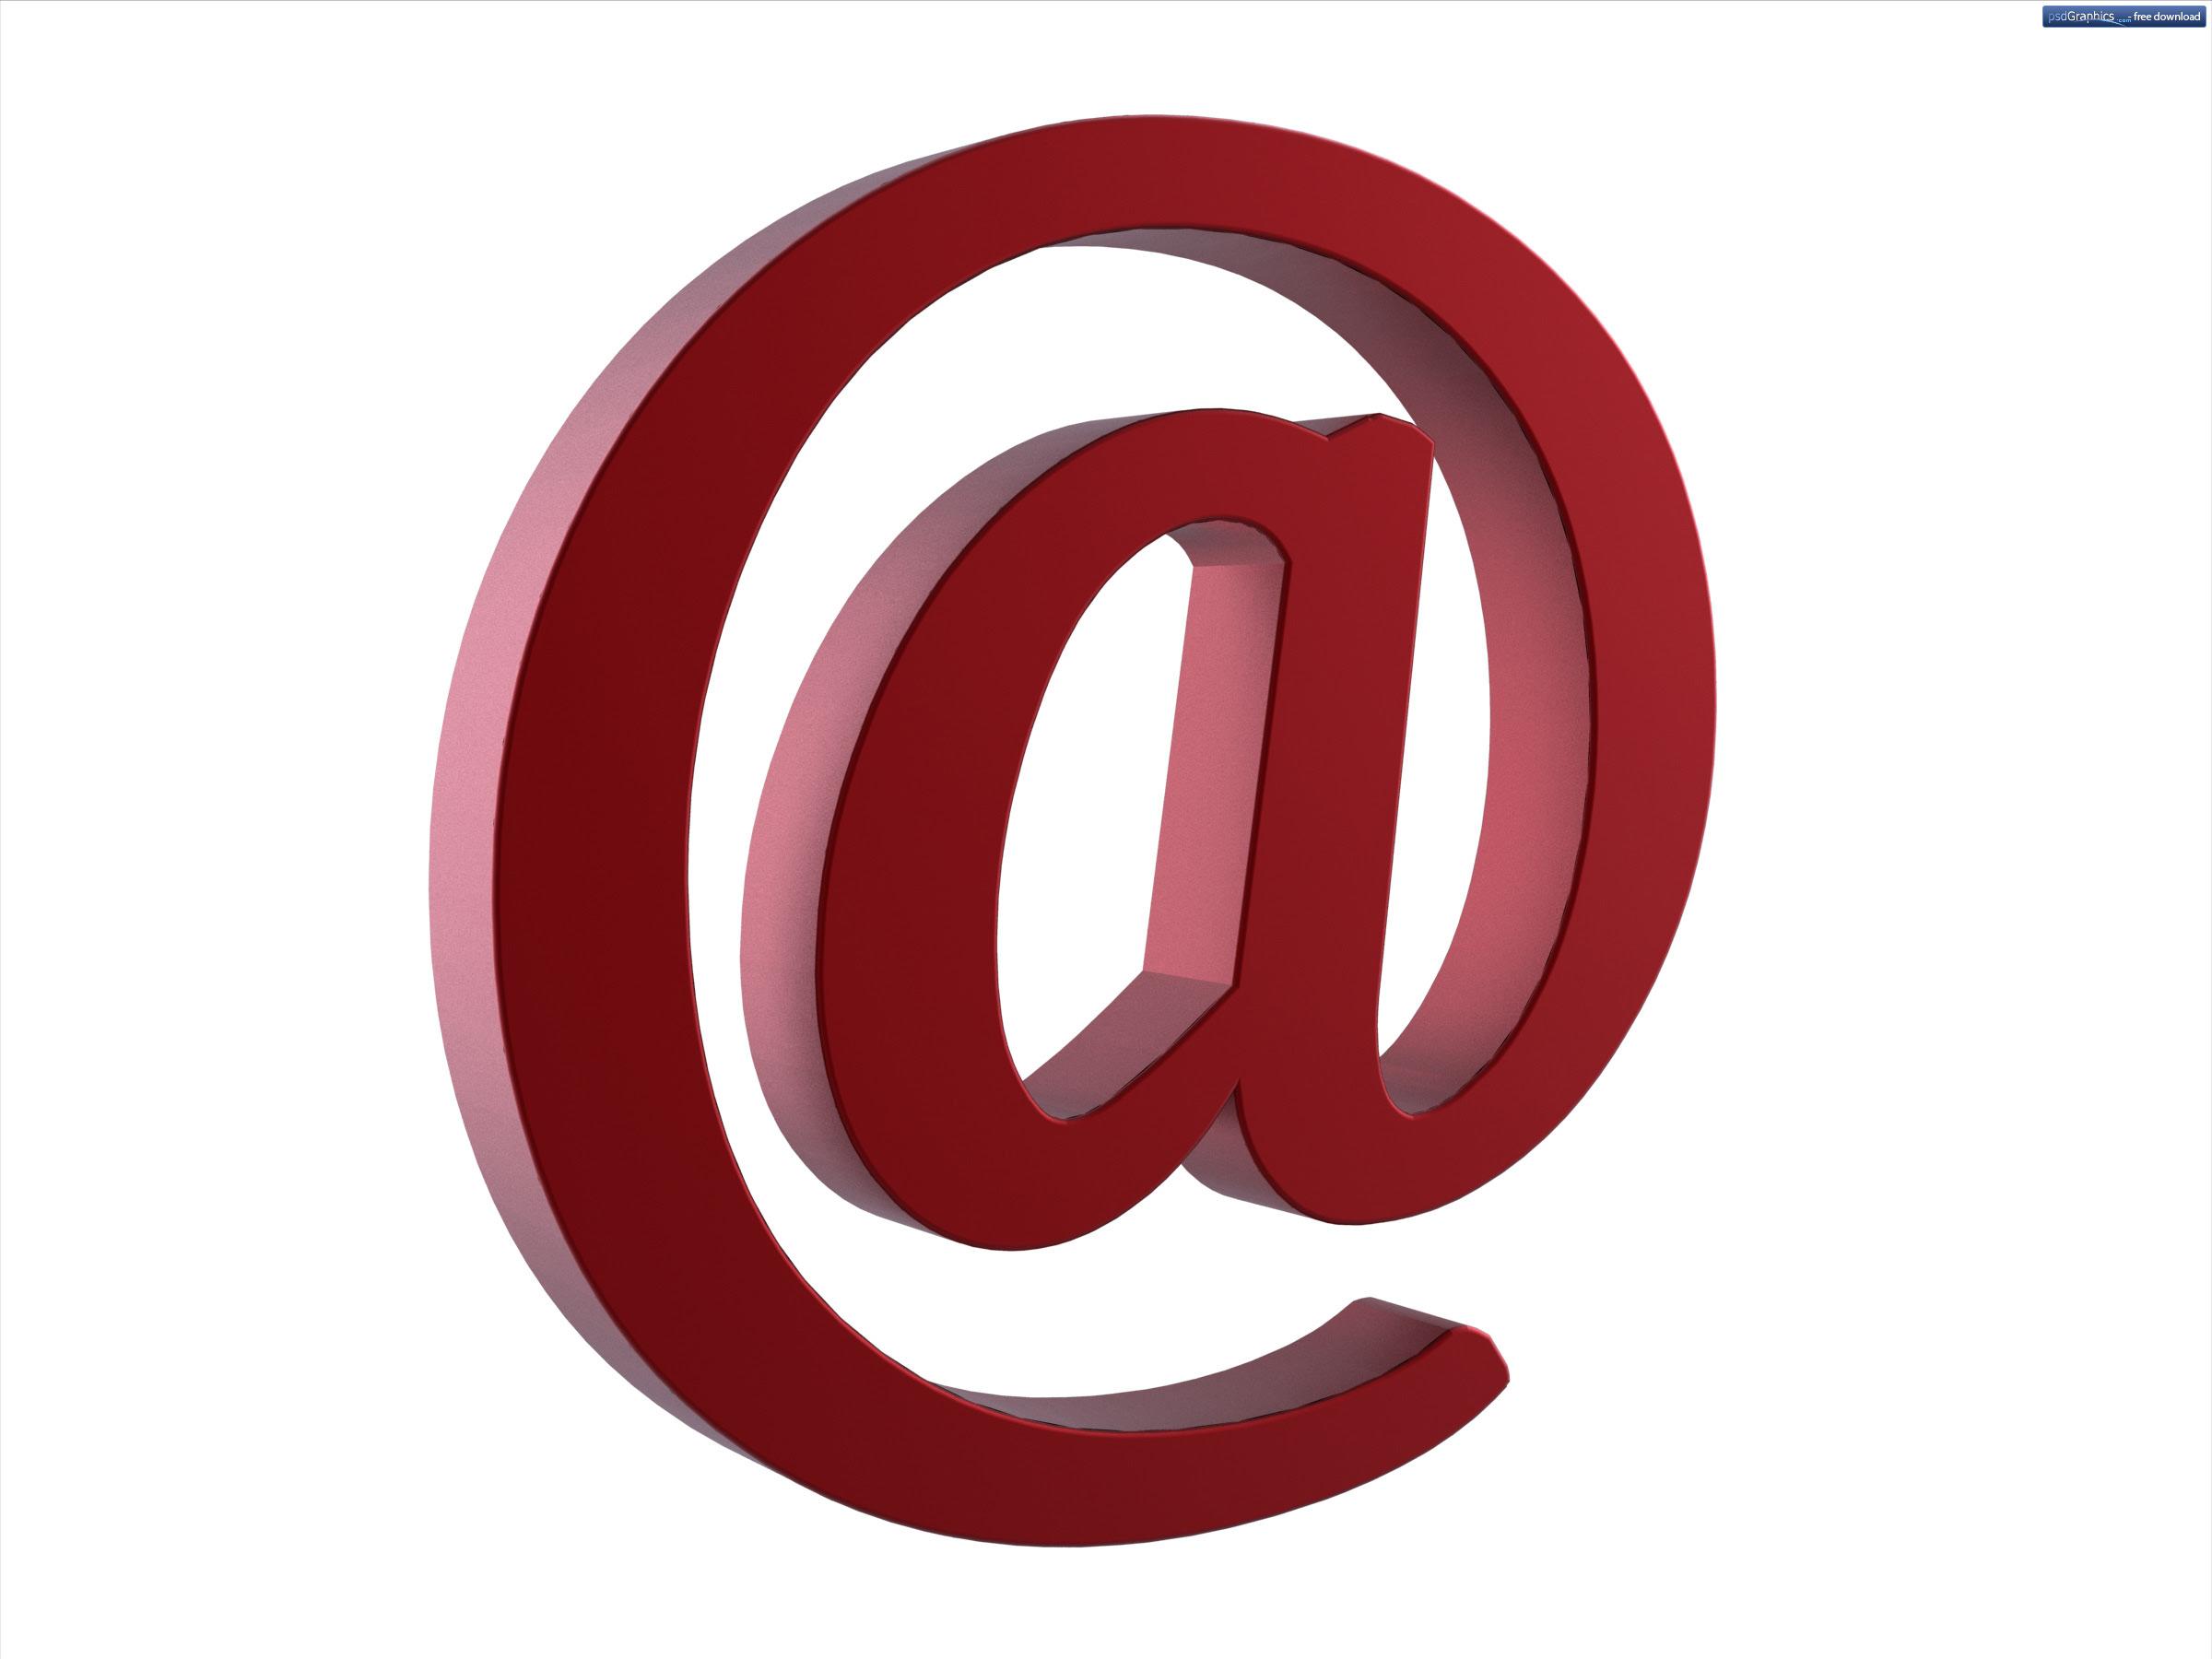 Email at symbol | PSDGraphics